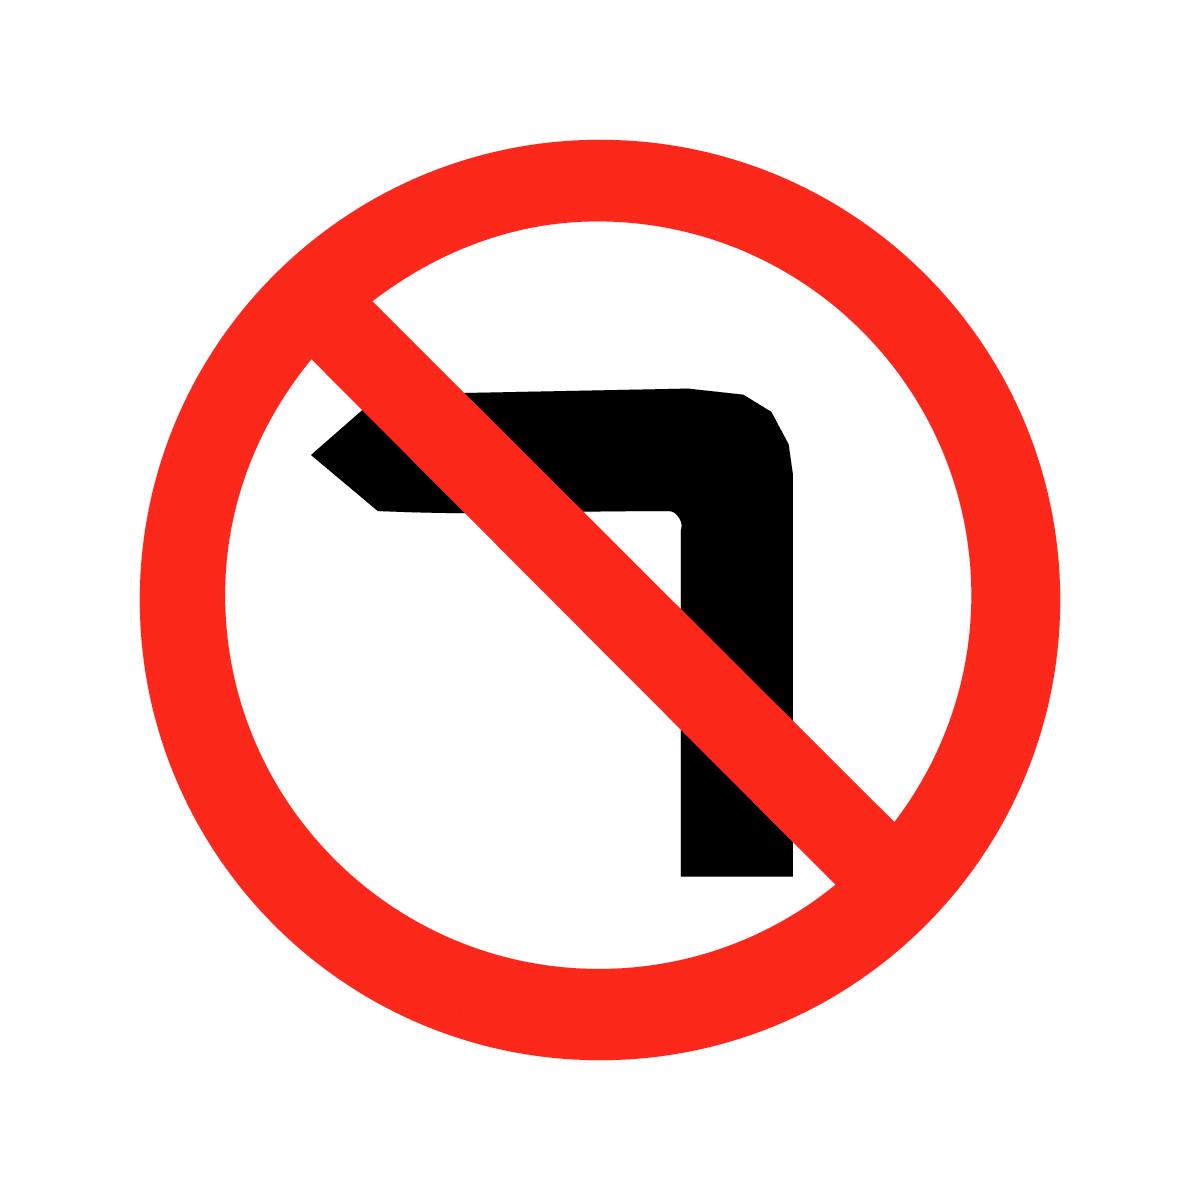 No Left Turn Safety Sign - Traffic Sign from BiGDUG UK ...